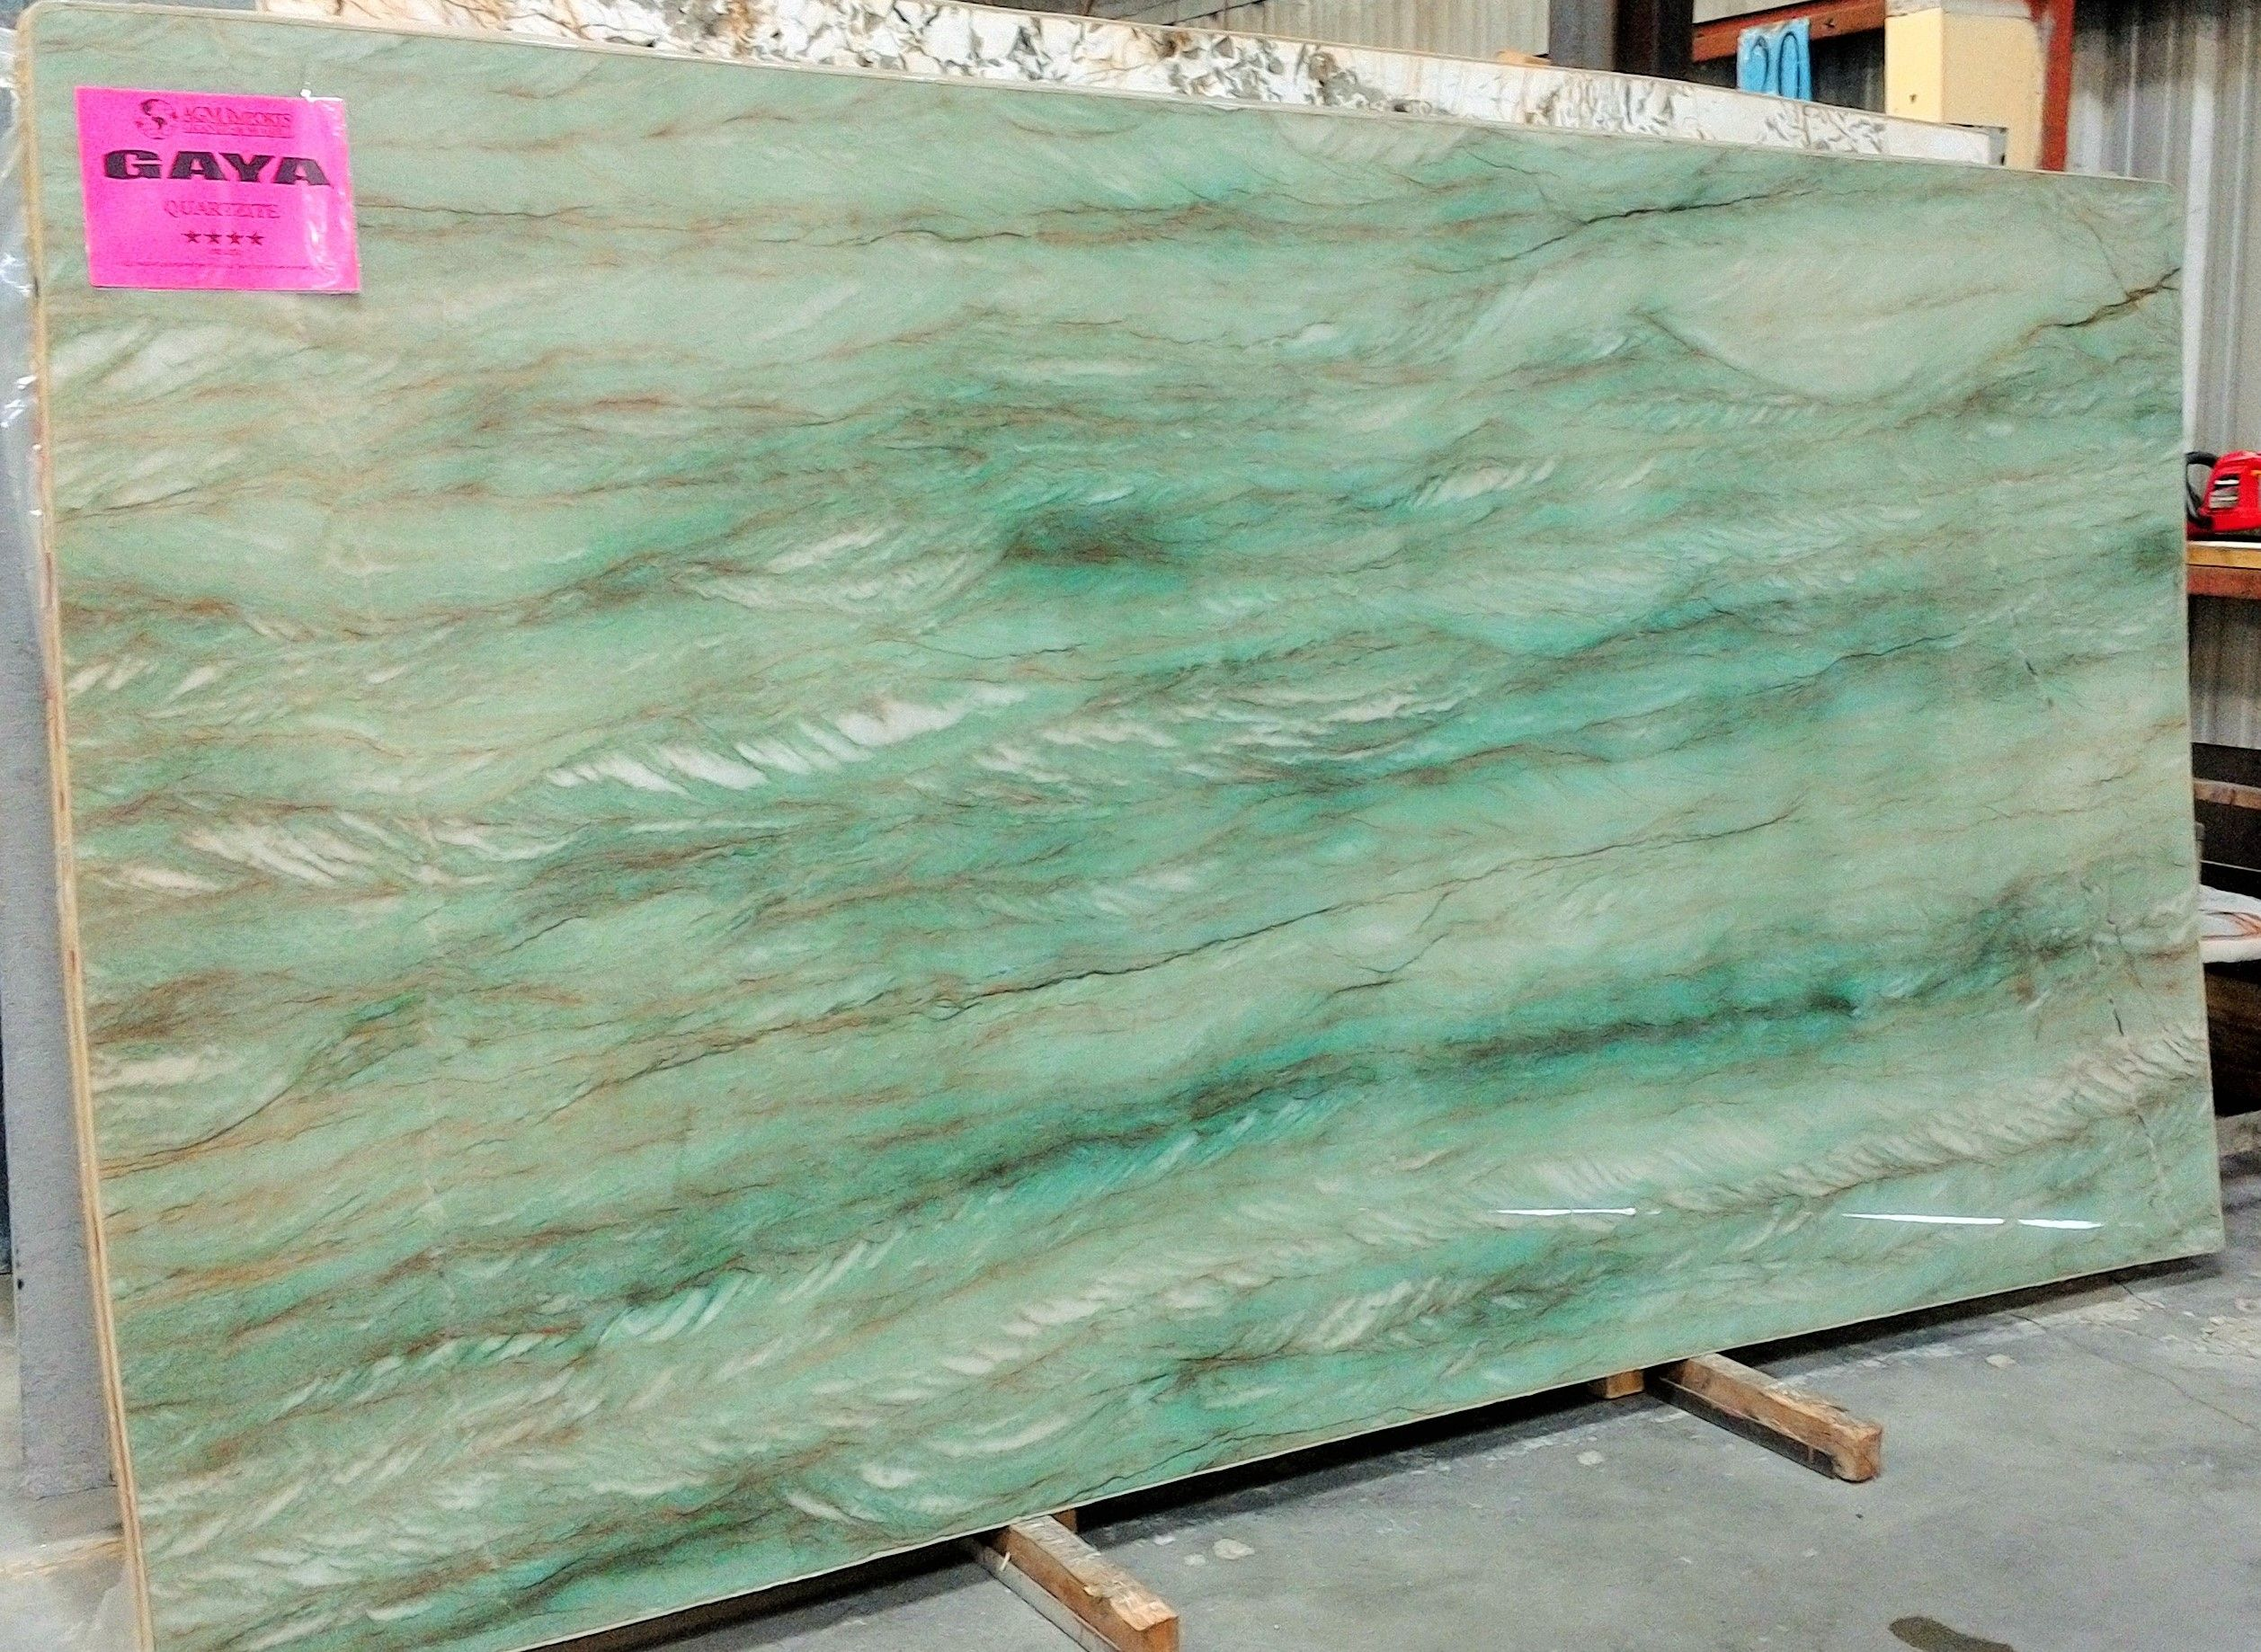 Gaya Marb6159 Quartzite Quartzite Countertops Stone